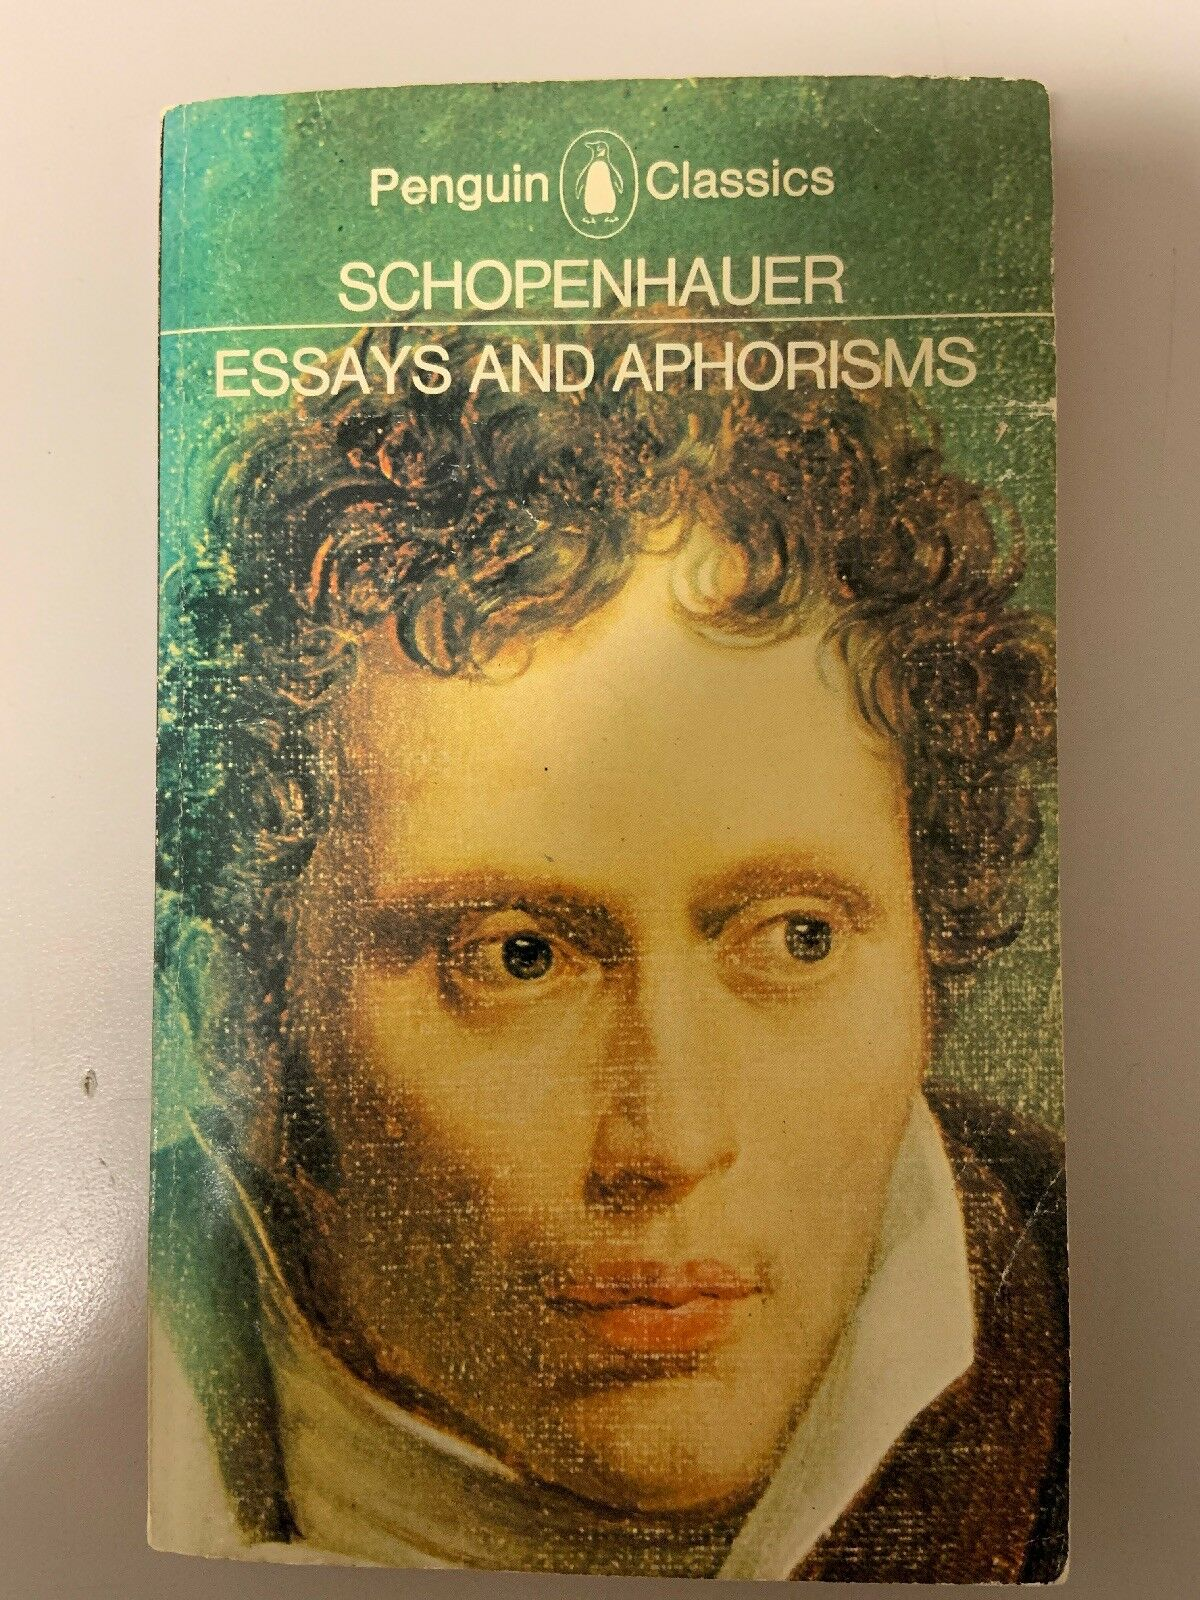 006 S L1600 Essays And Aphorisms Essay Frightening Pdf Schopenhauer Full